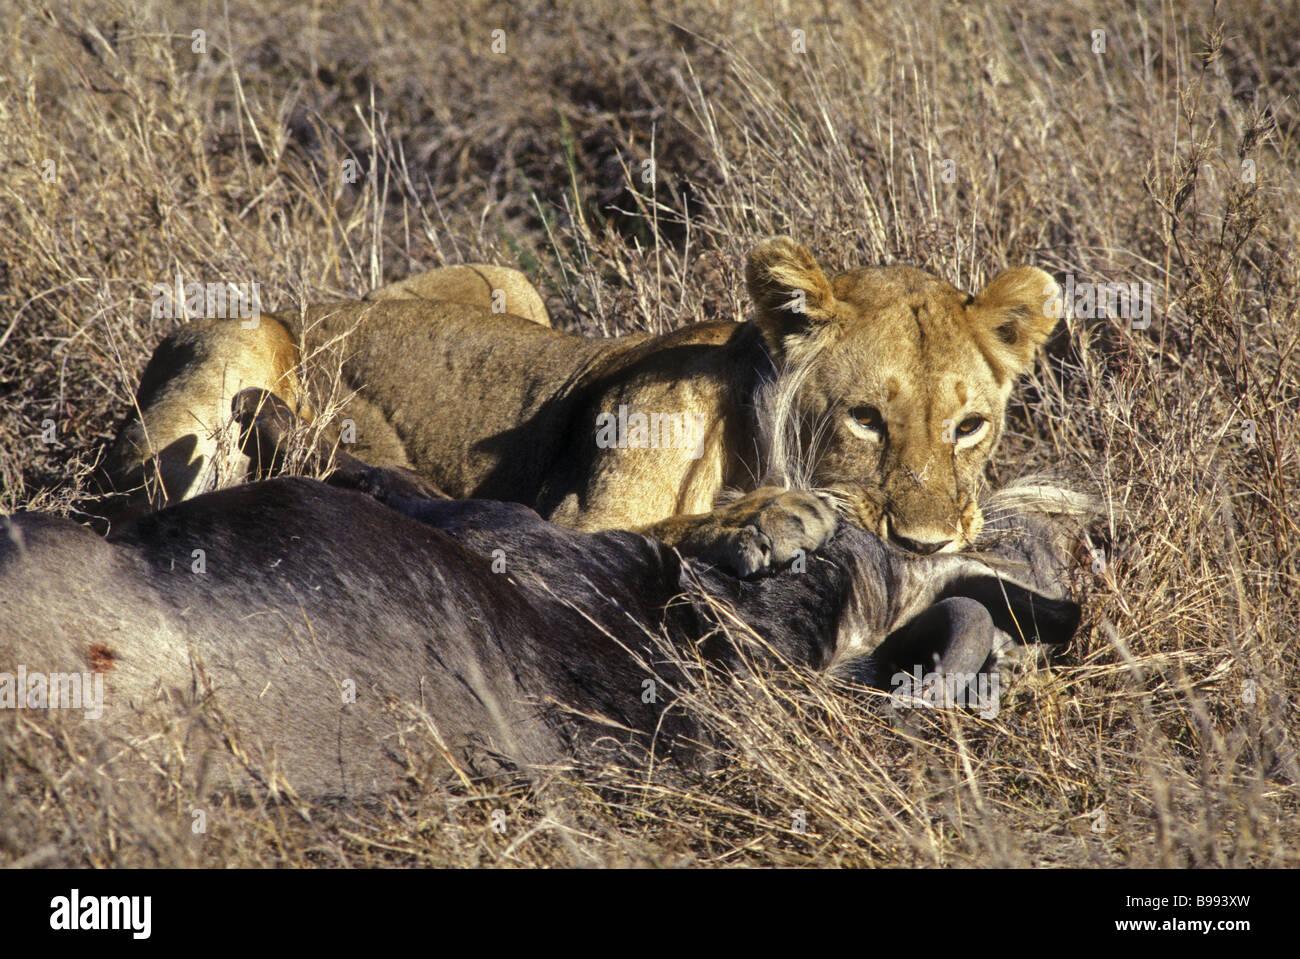 Lioness killing wildebeest Masai Mara National Reserve Kenya East Africa - Stock Image